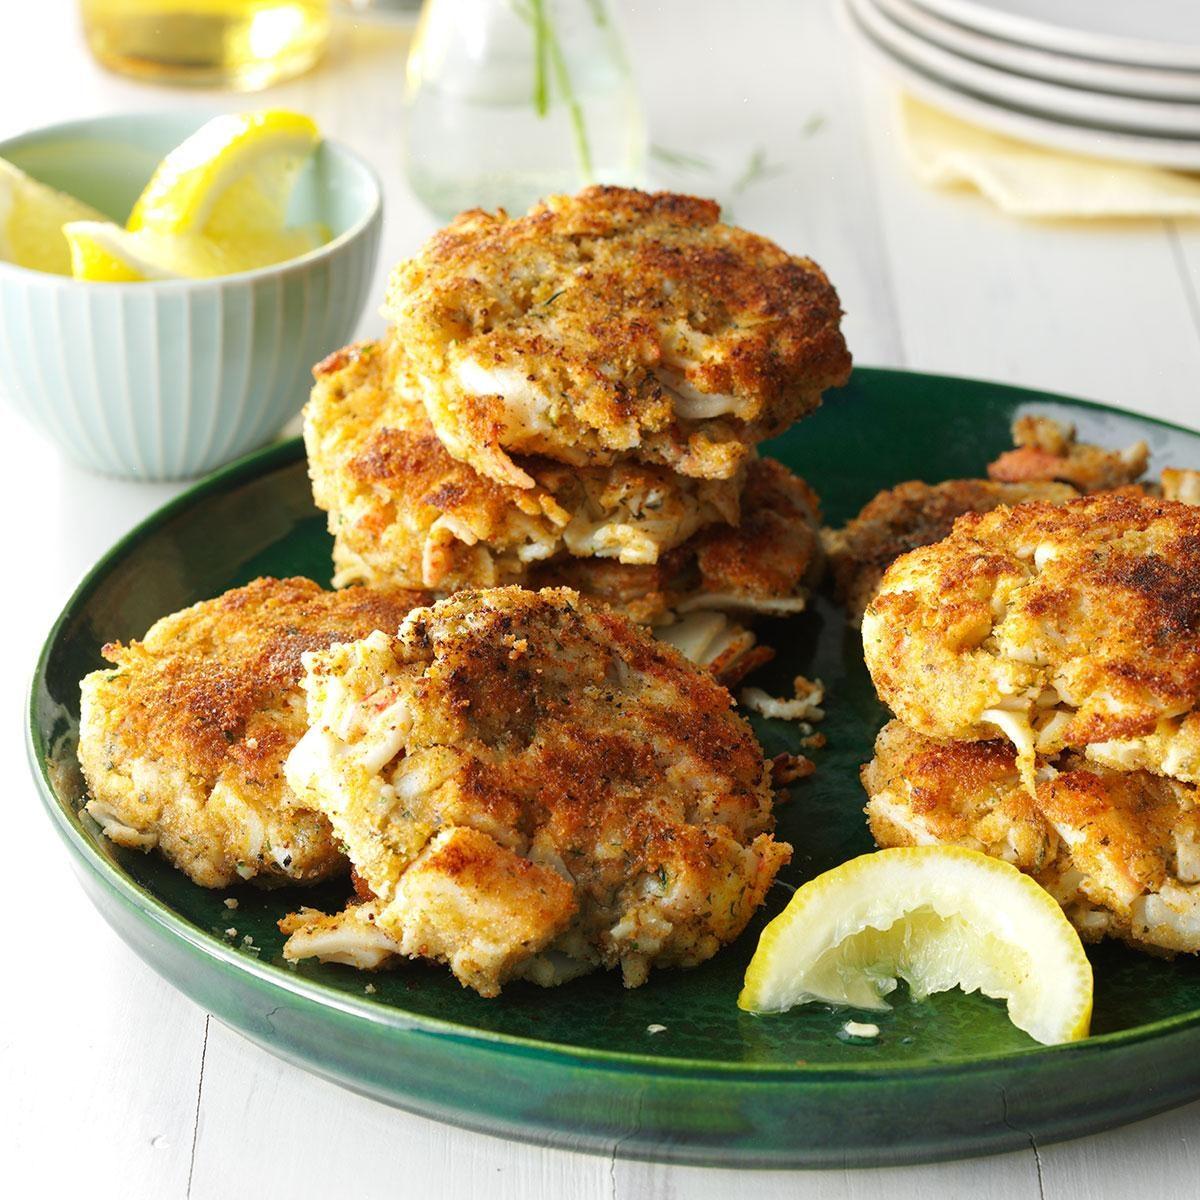 Taste Of Home Heavenly Crab Cakes